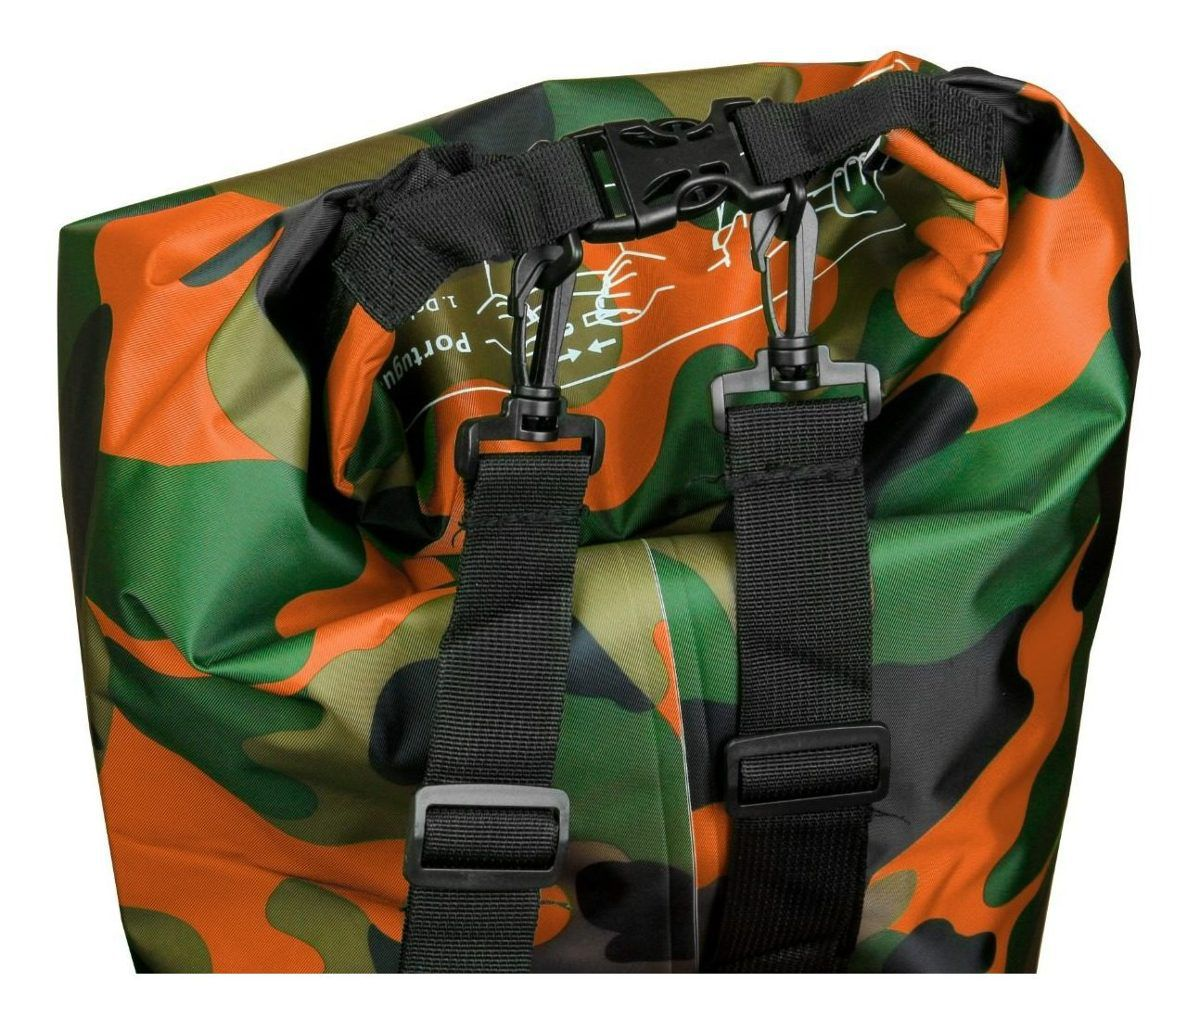 Bolsa Impermeável Albatroz Fishing Camp Bag Camuflada Laranja 20 Litros